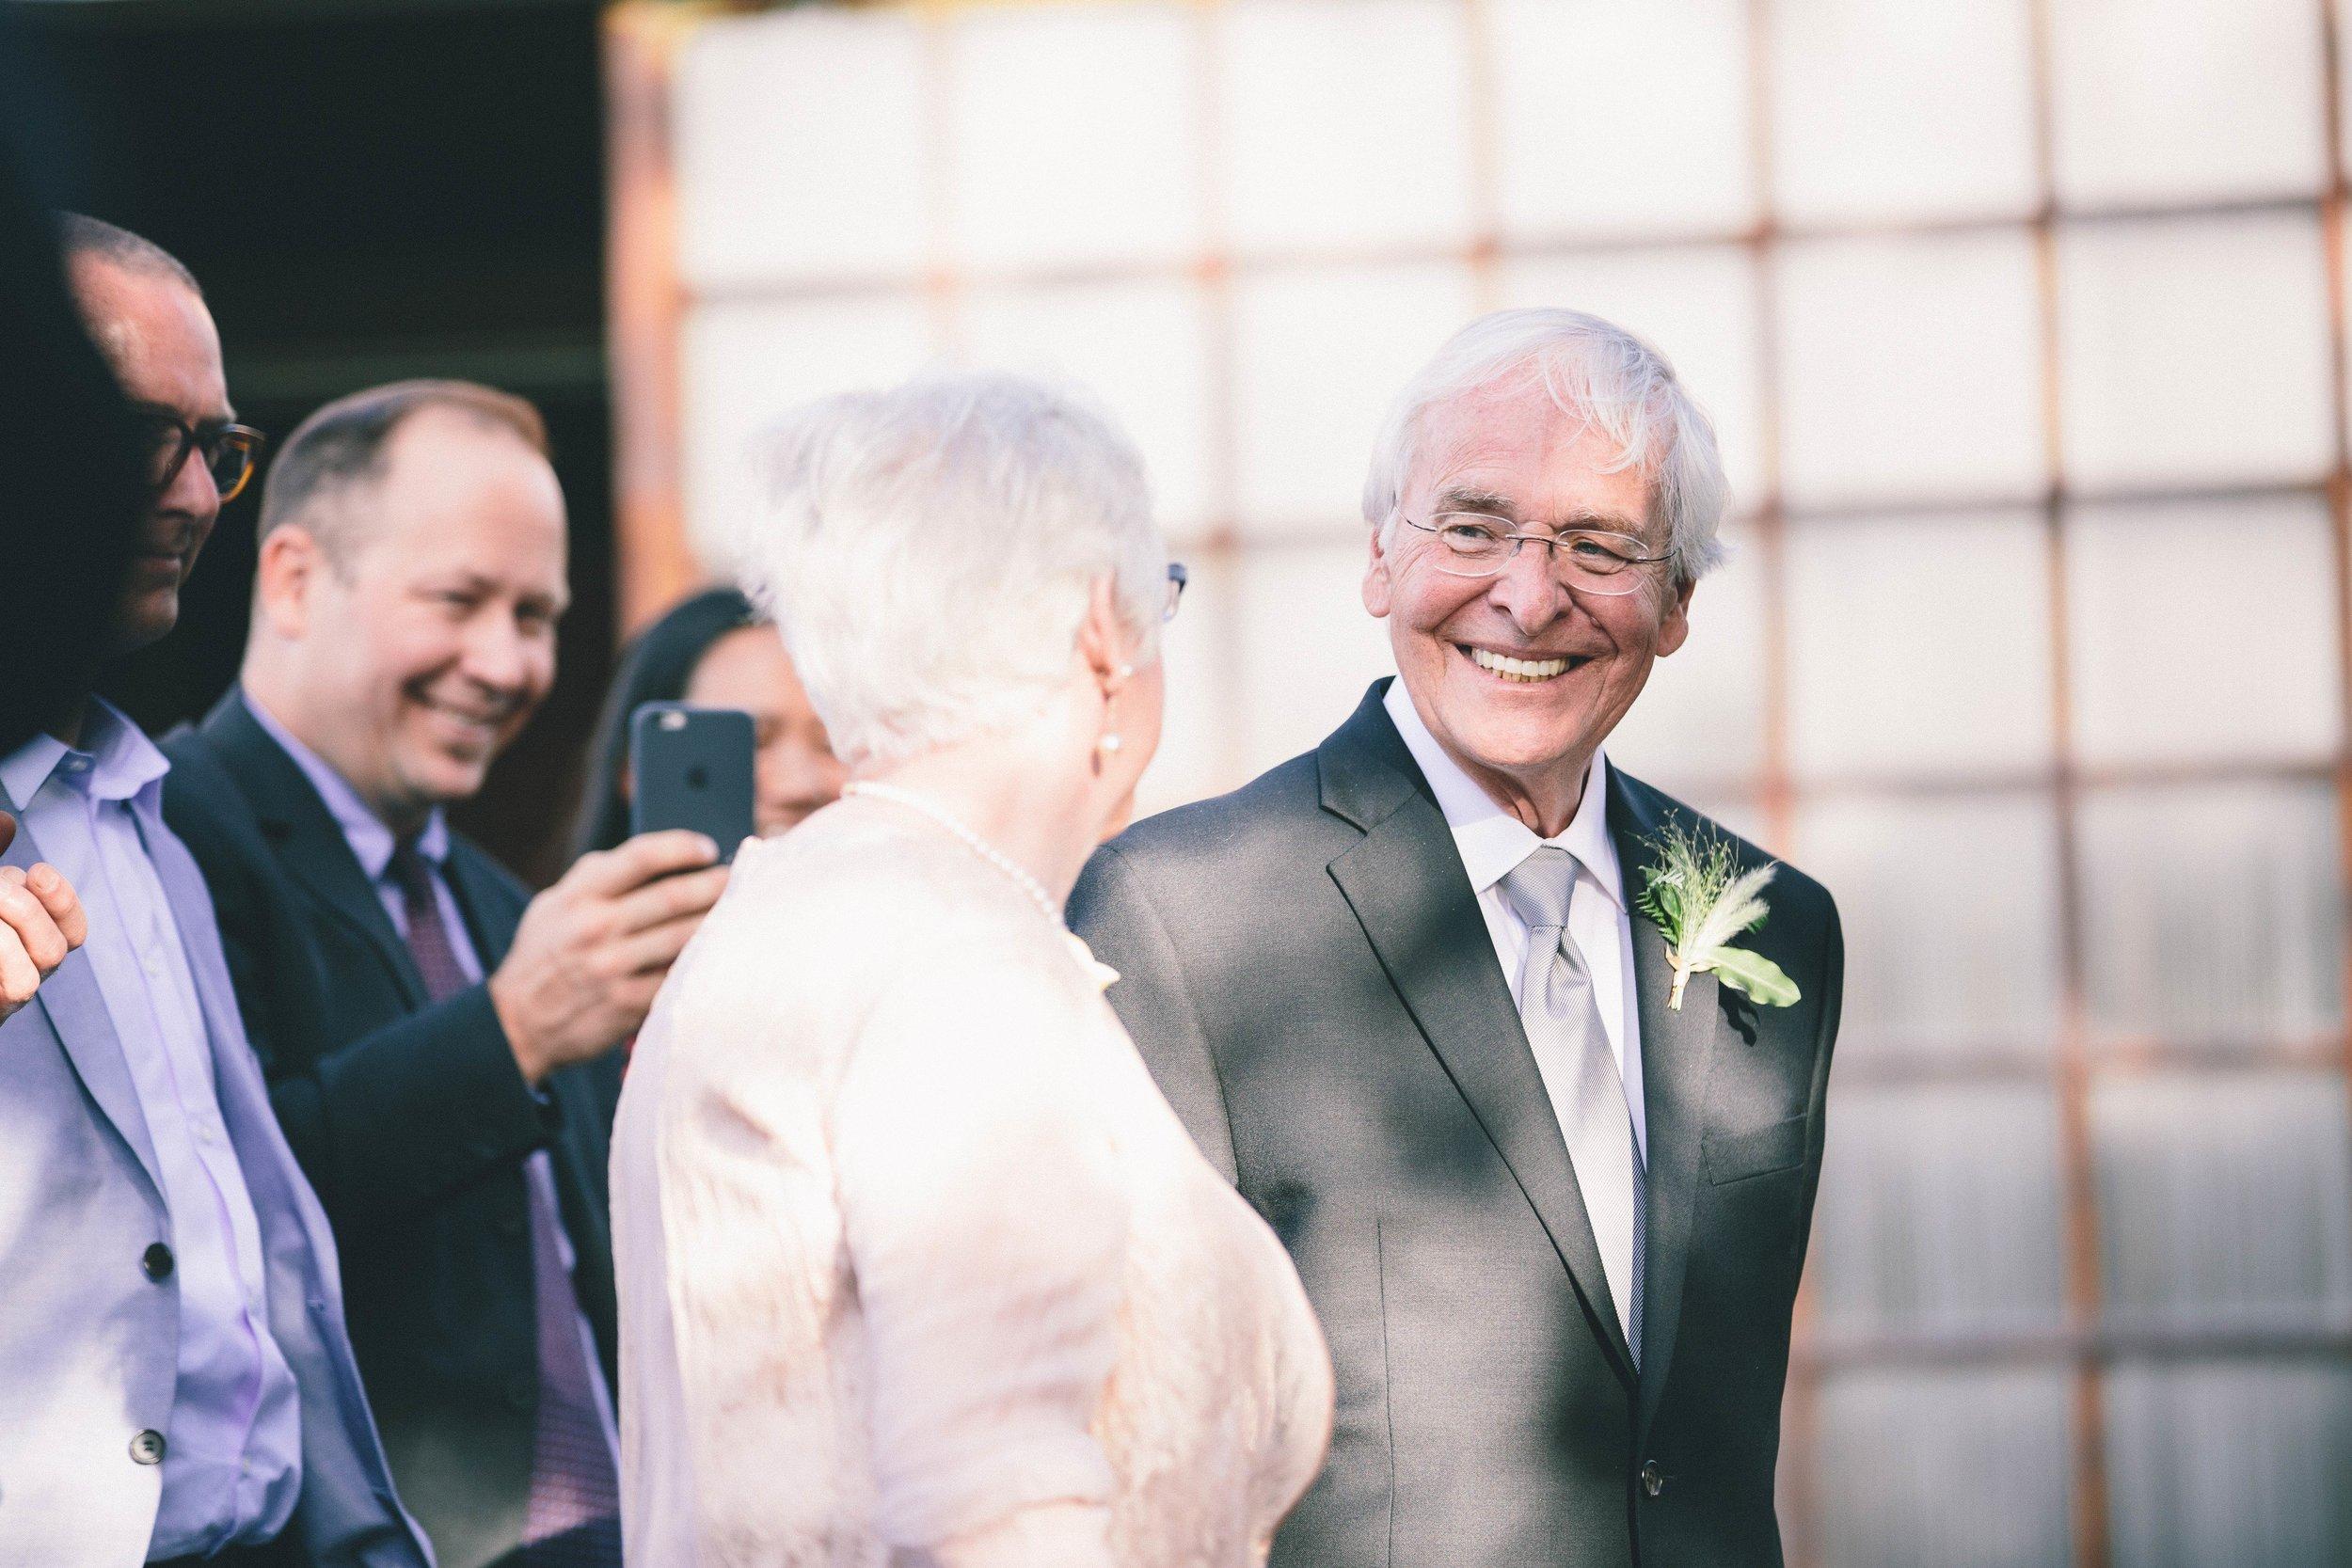 MP_16.05.21_Tina-&-Brad-Wedding-no-grain-0155.jpg